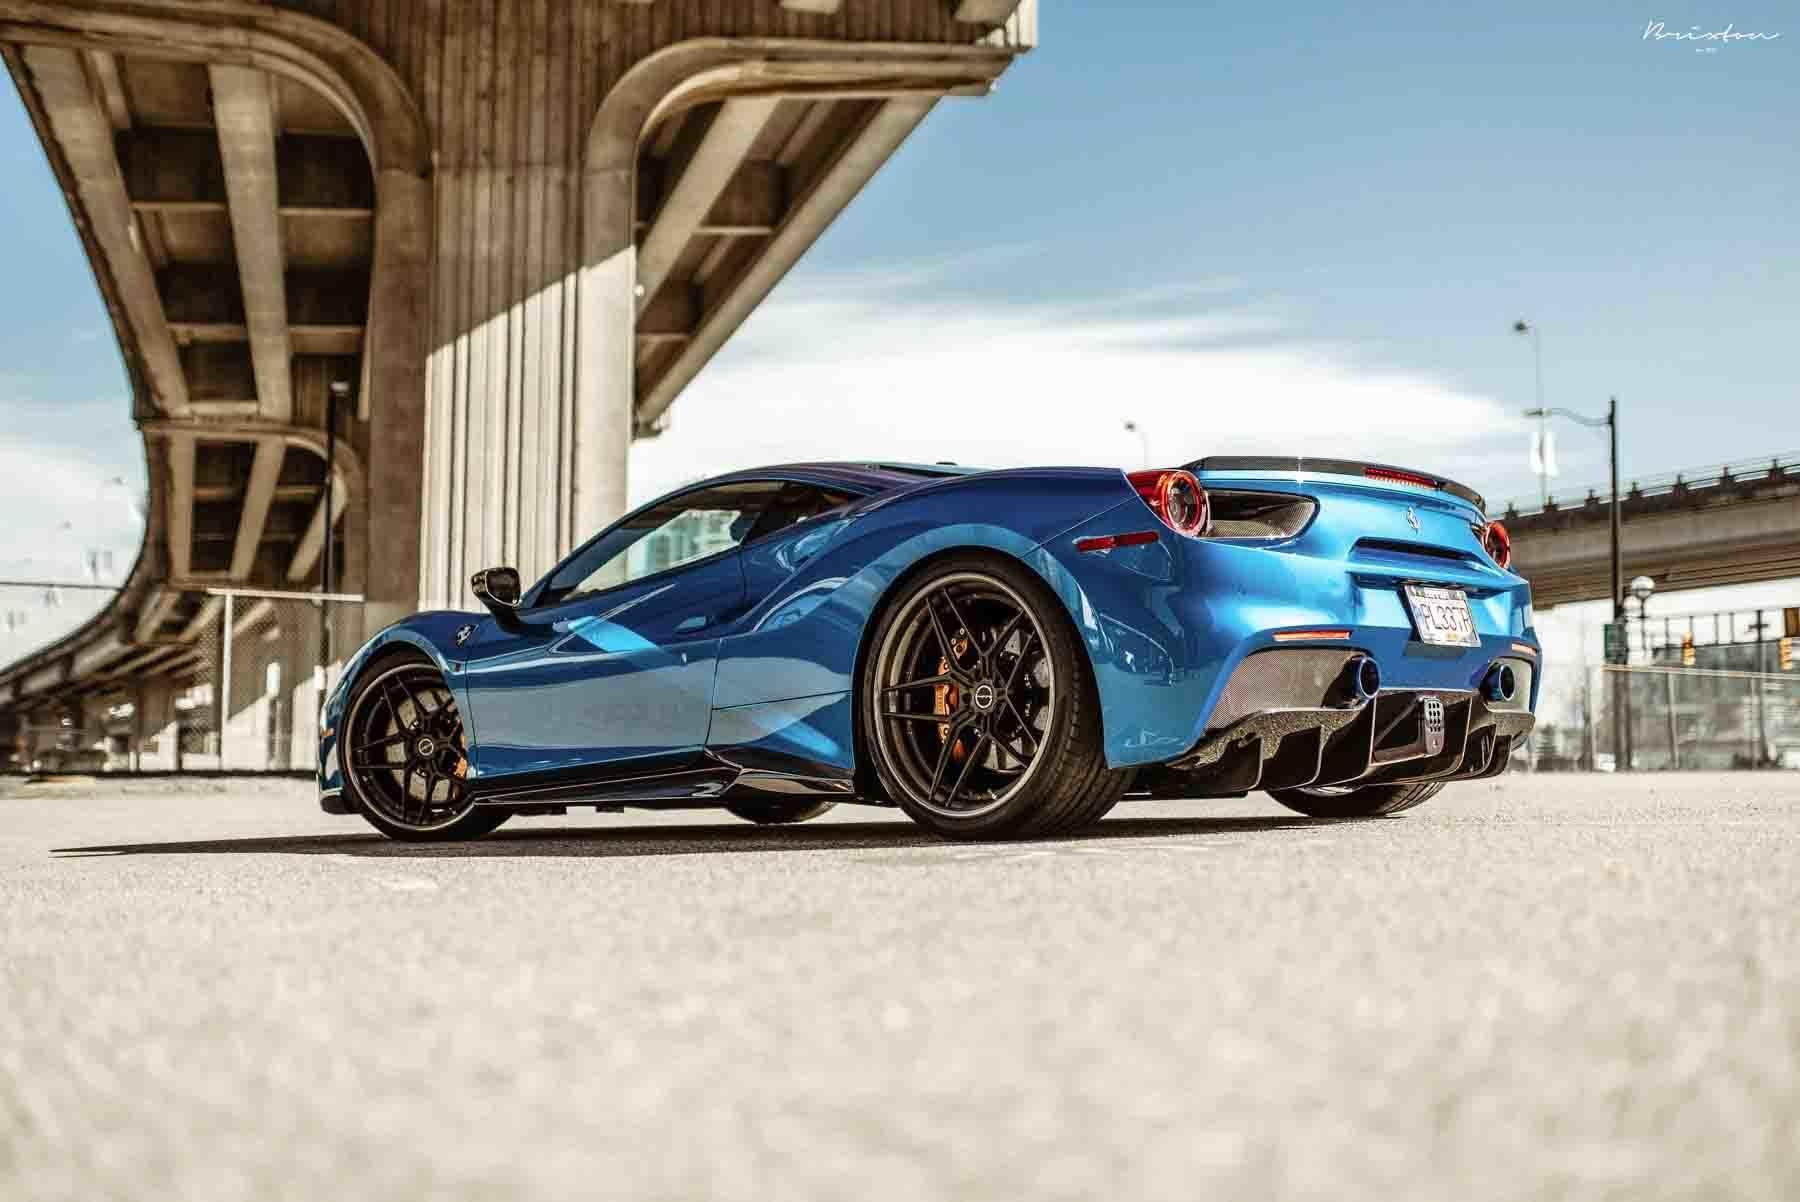 images-products-1-2423-232974711-blue-ferrari-488-gtb-brixton-forged-wr7-targa-series-brushed-smoke-black-wheels-15-1800x1202.jpg